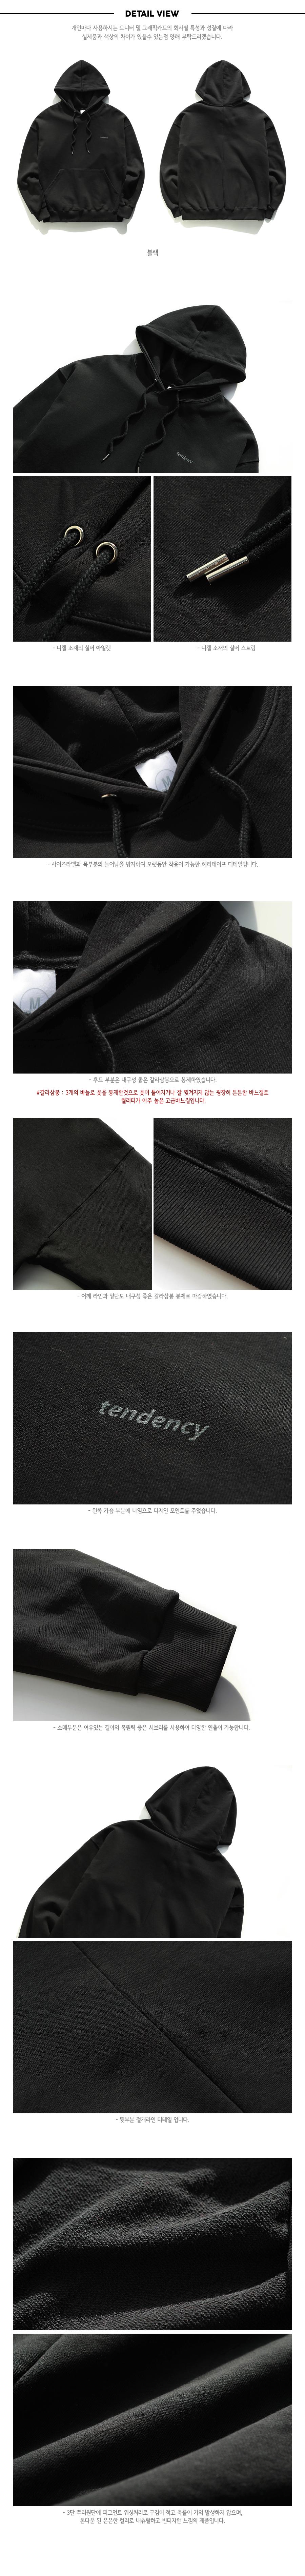 20190114_pigment_washing_hood_black_yh.jpg